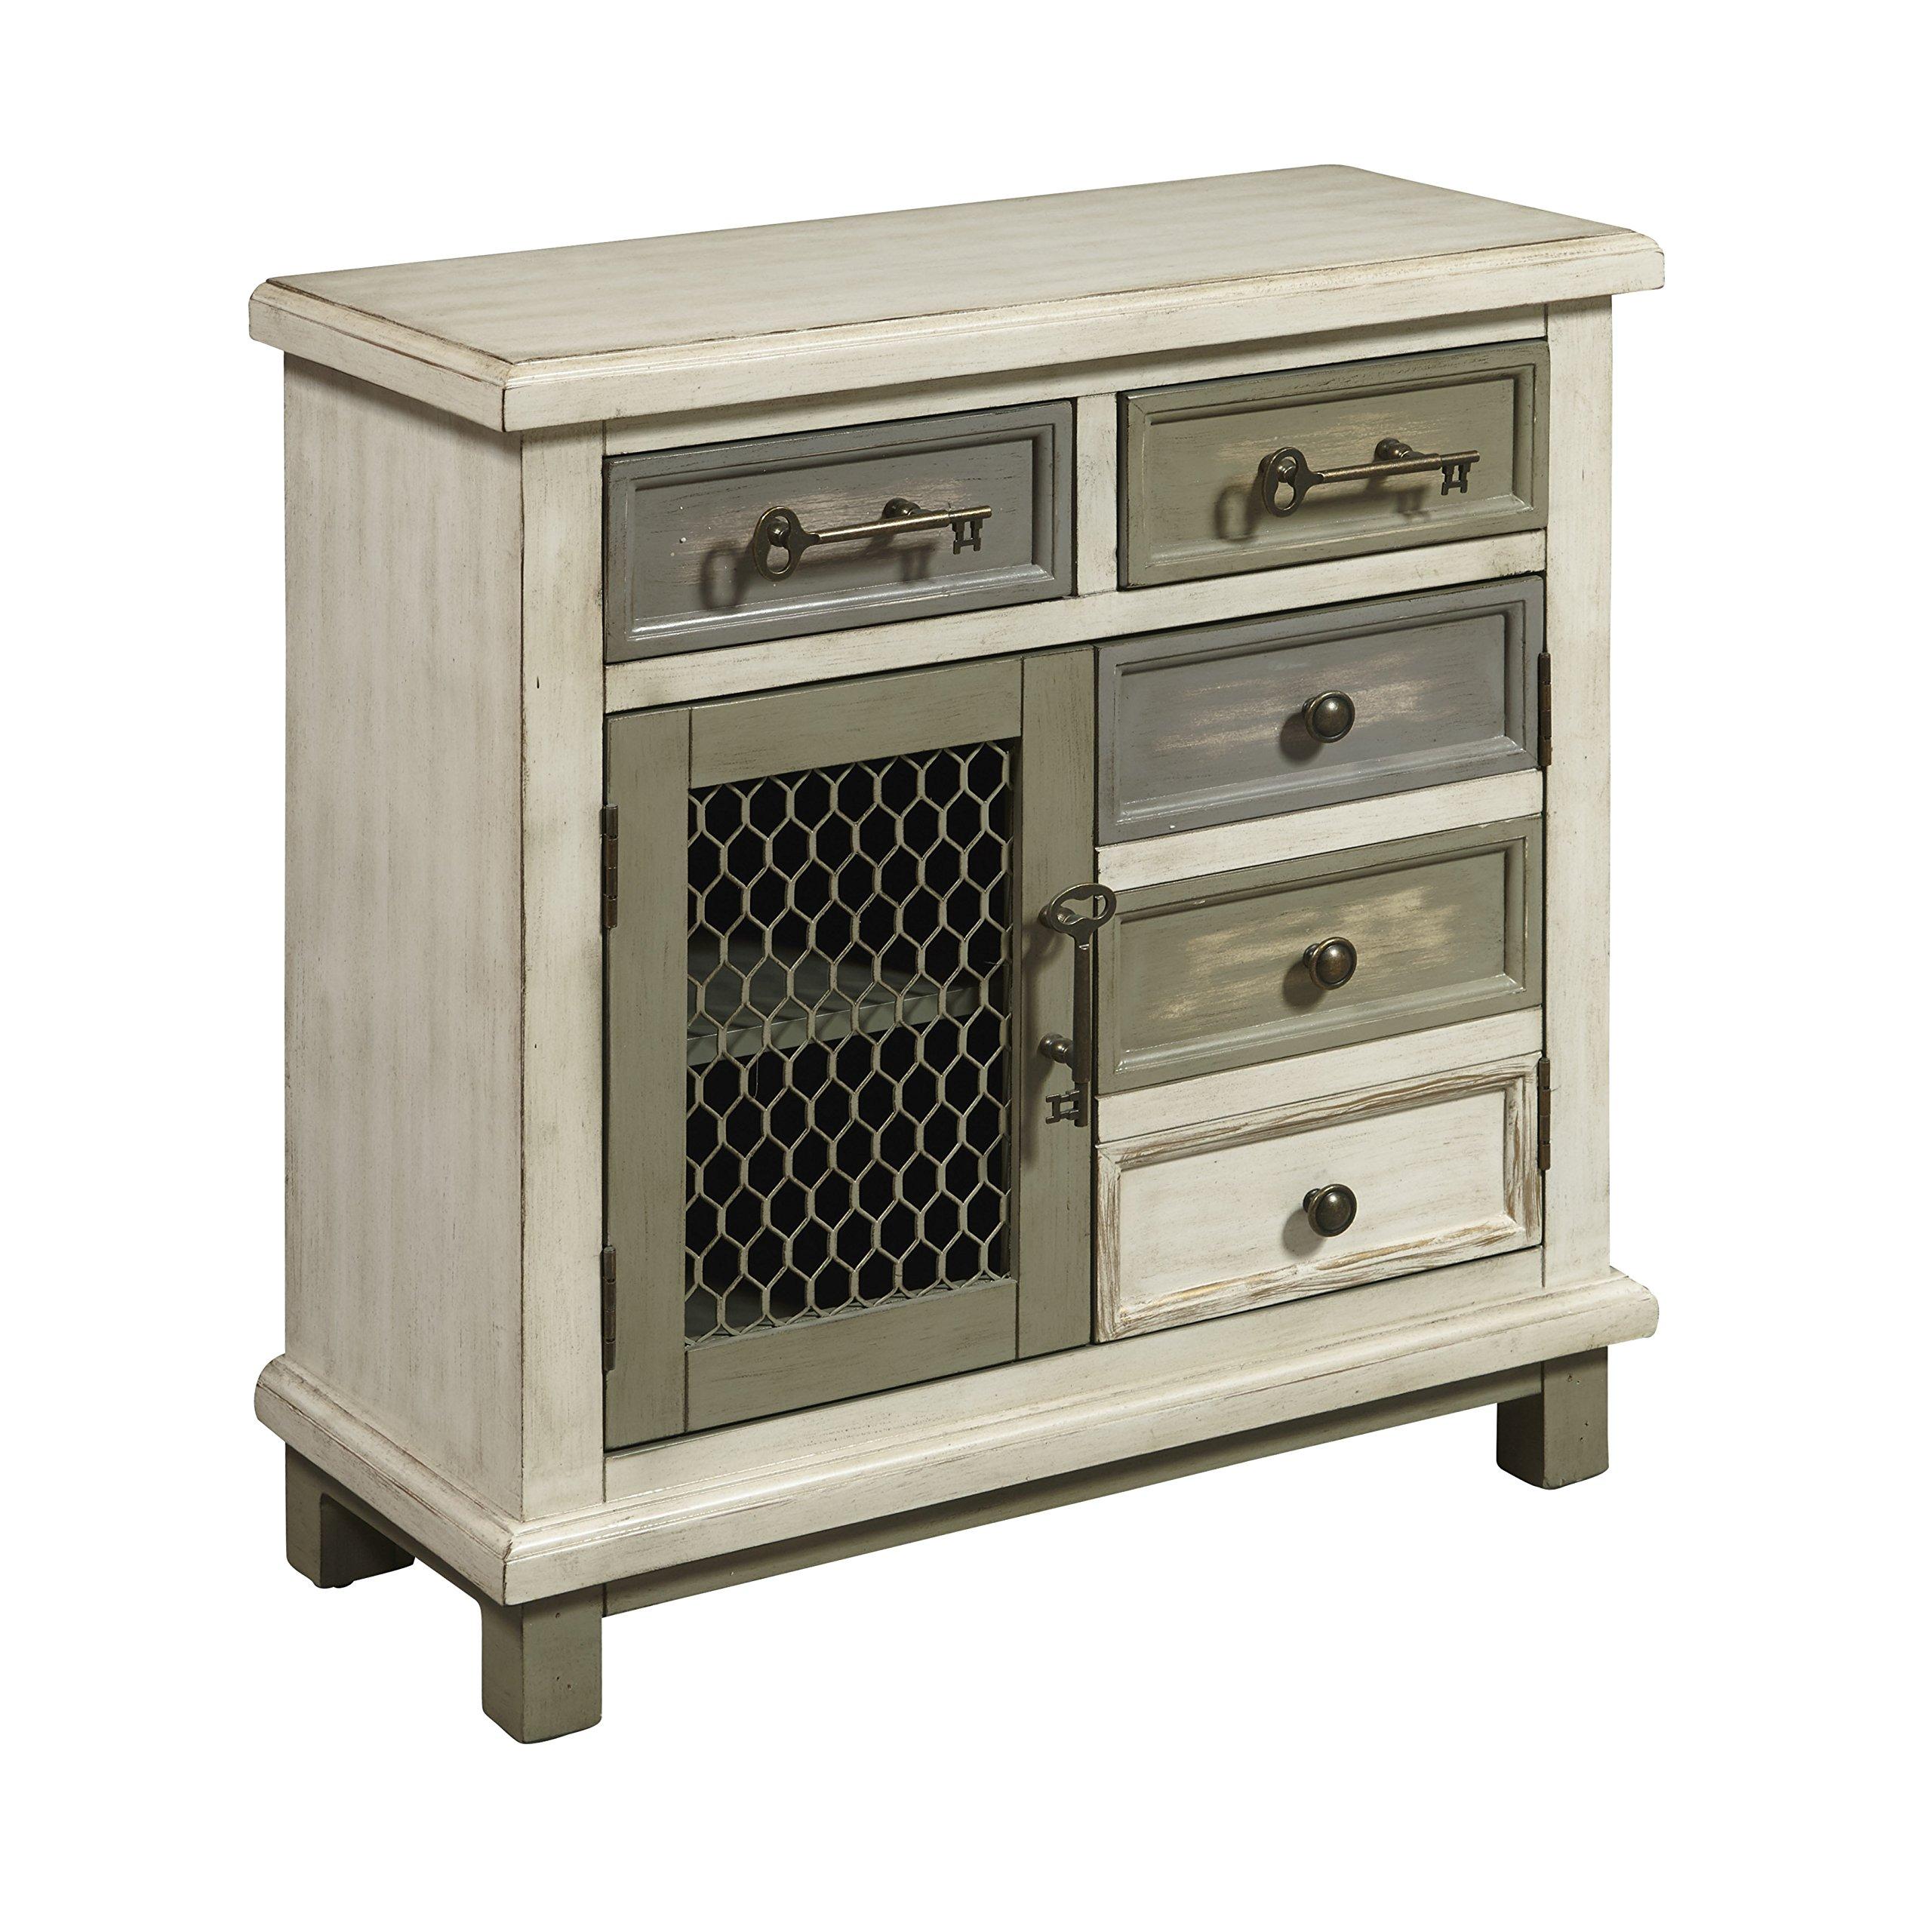 accent furniture chests and cabinets amazon com rh amazon com